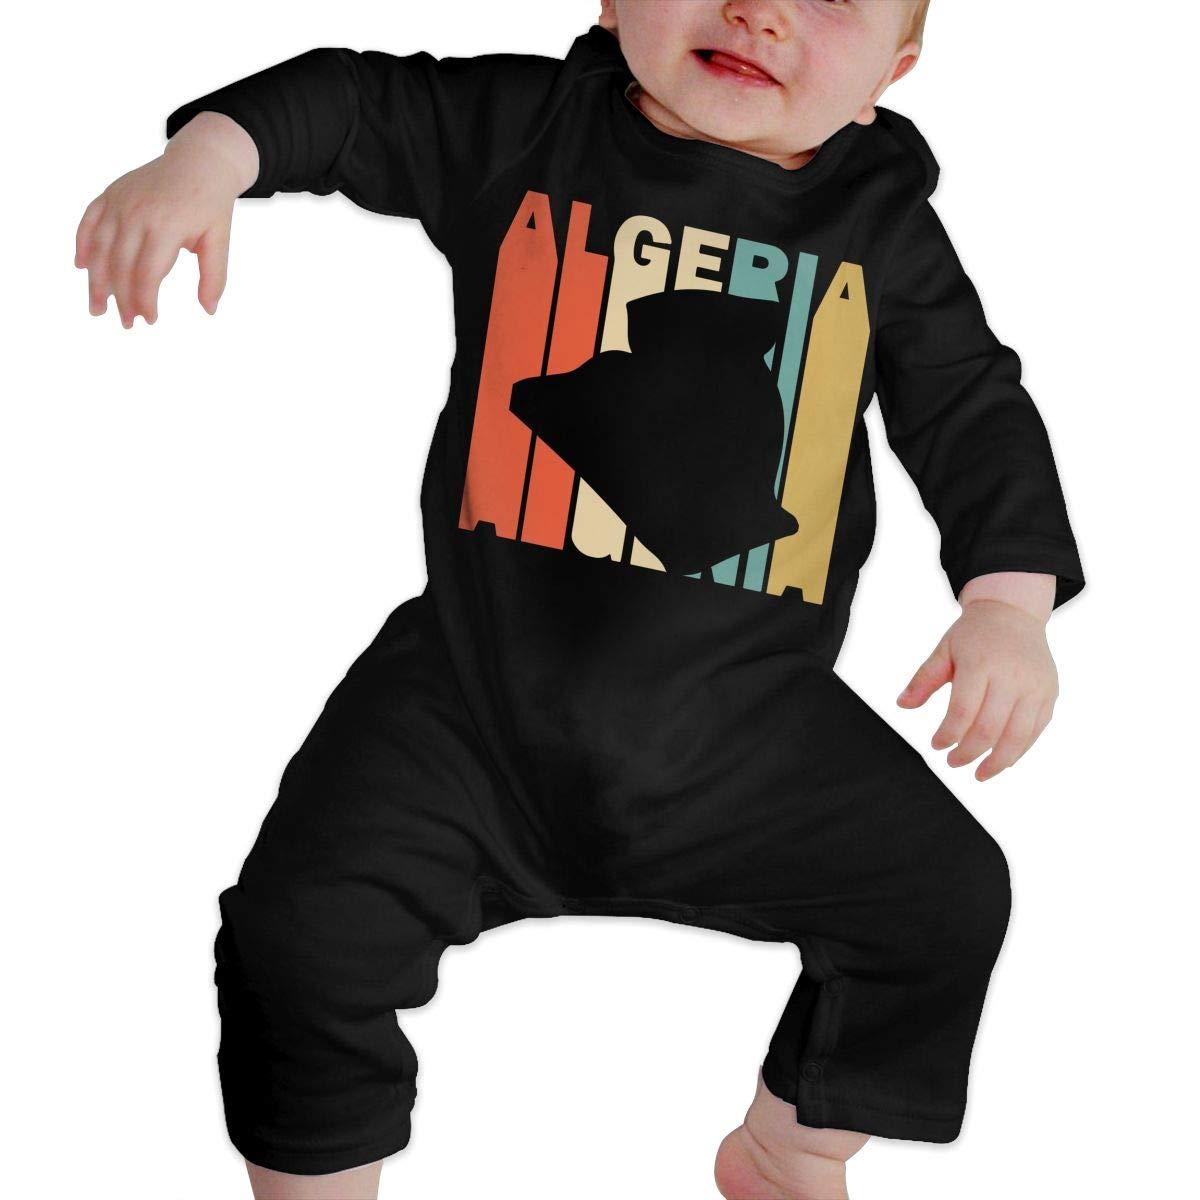 Fashion Retro Style Algeria Silhouette Jumpsuit Long Sleeve Cotton Bodysuit for Unisex Baby